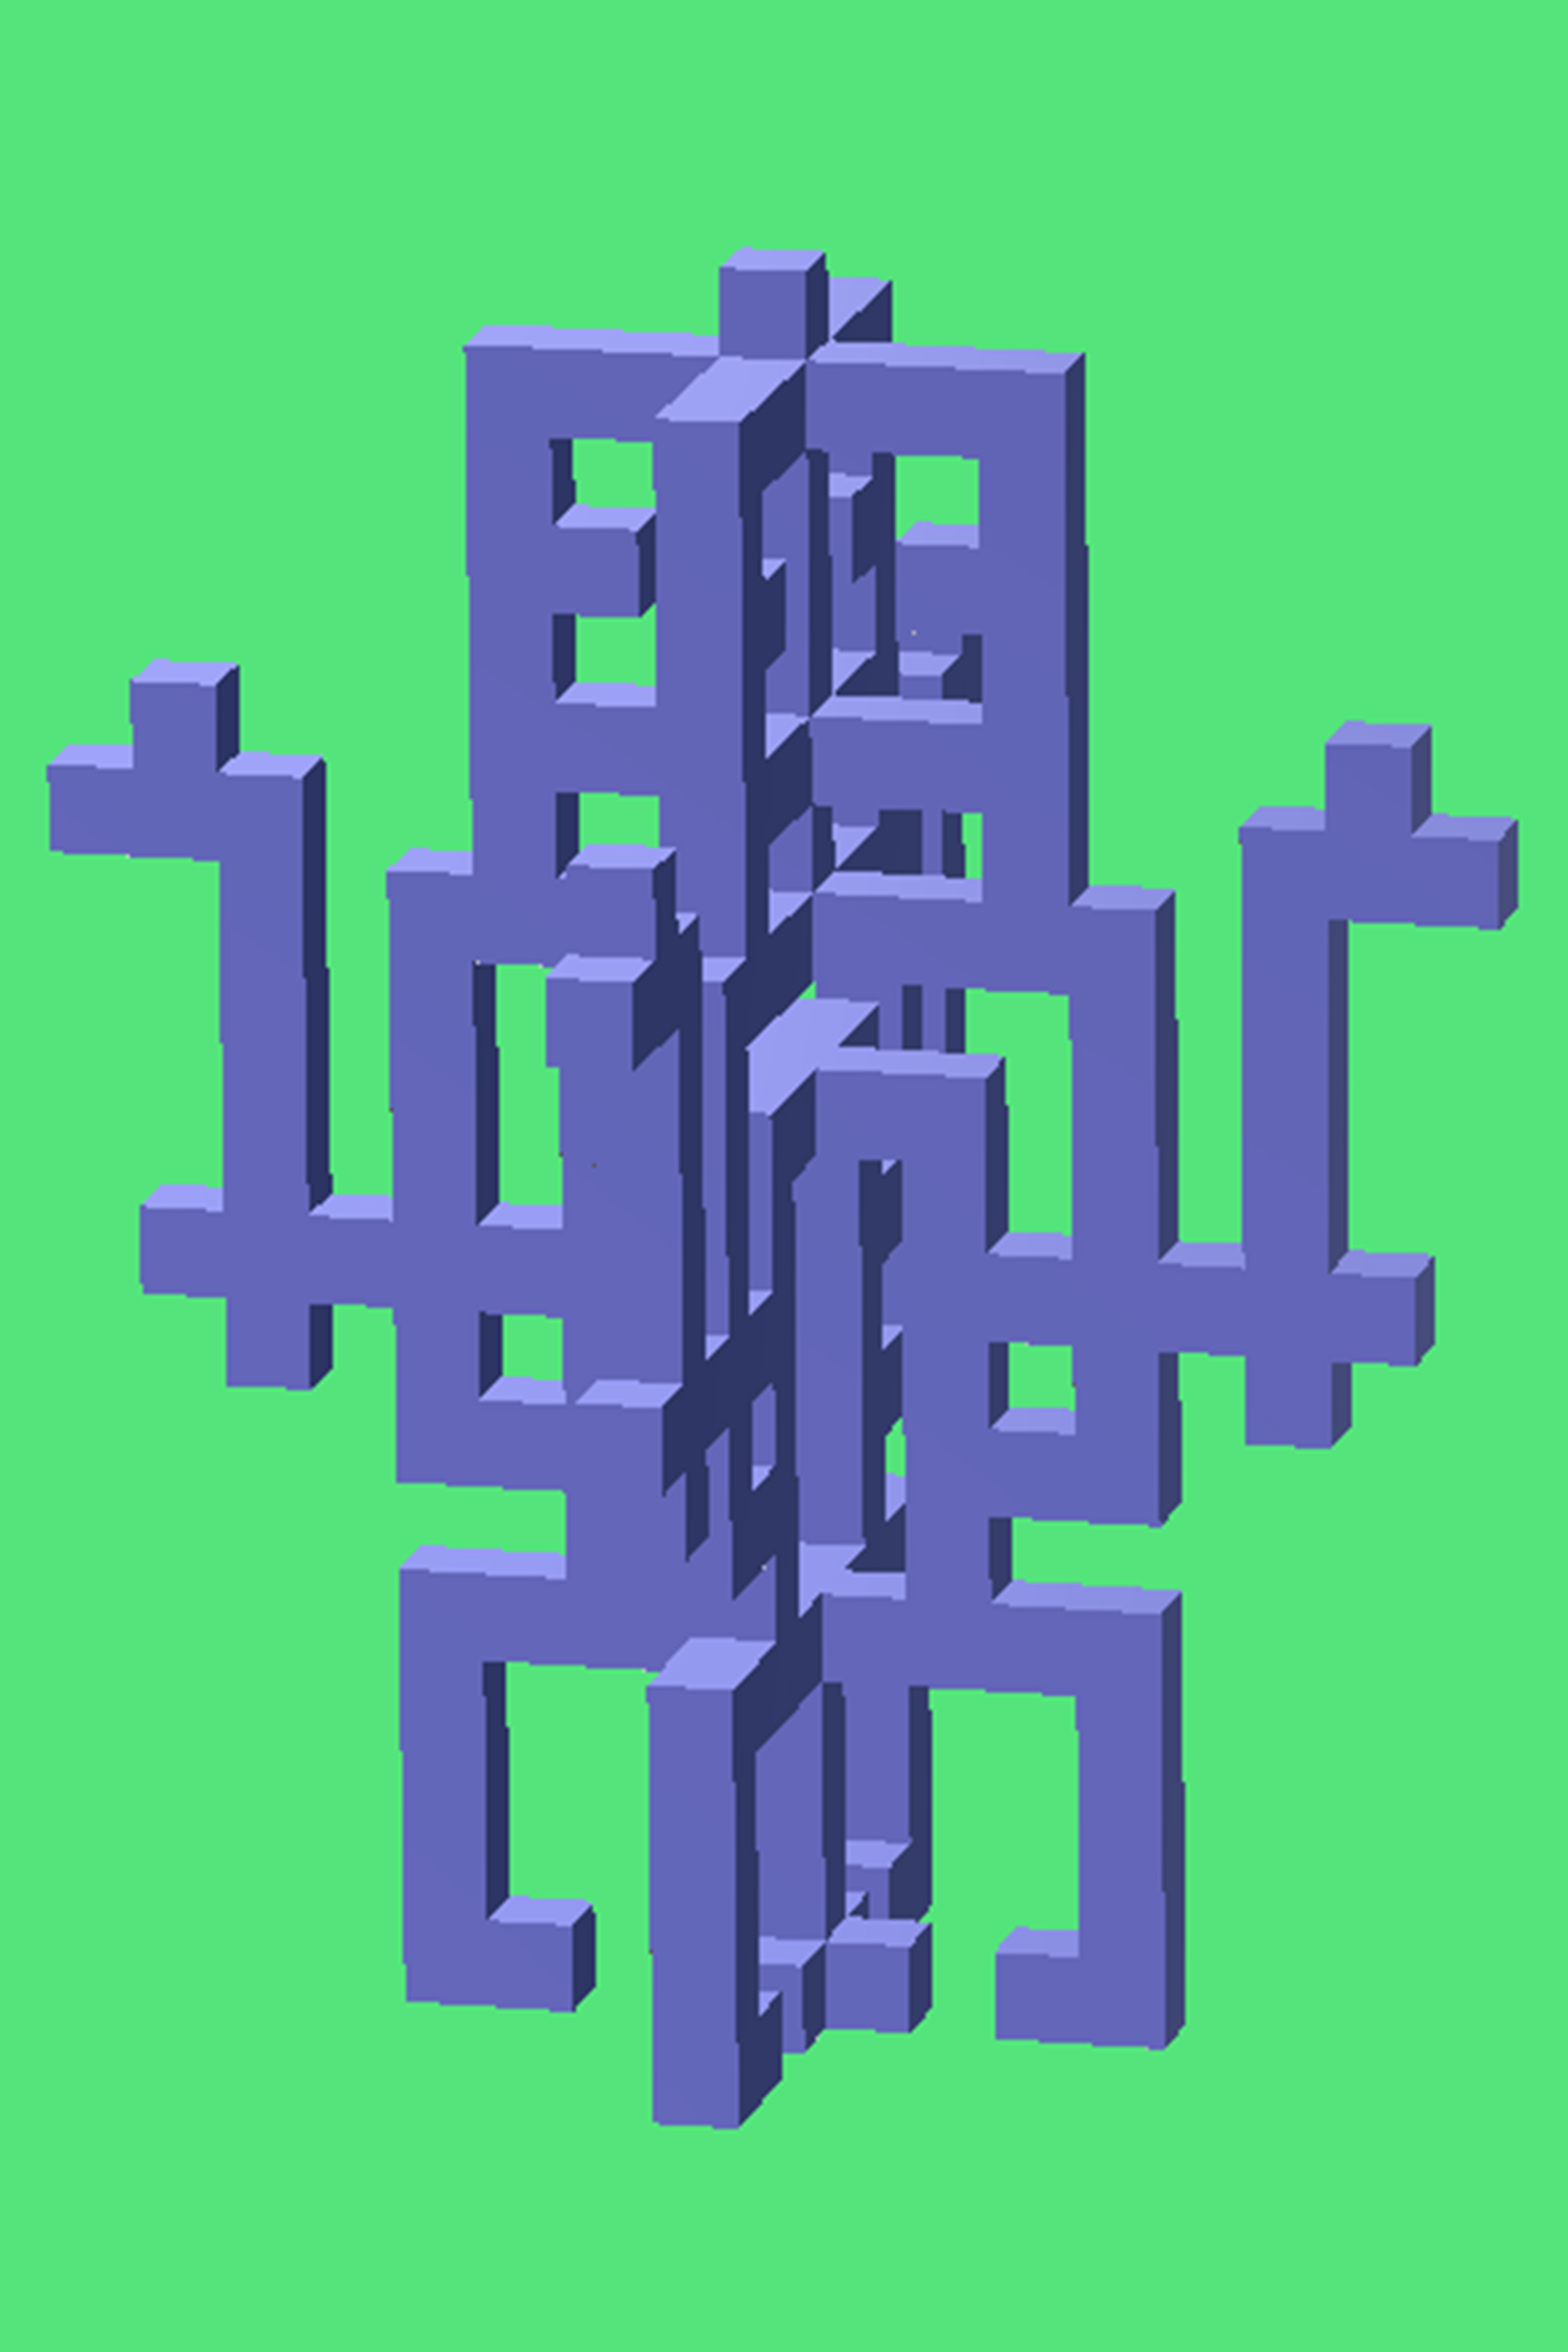 Genii_Col_7_graph.jpg